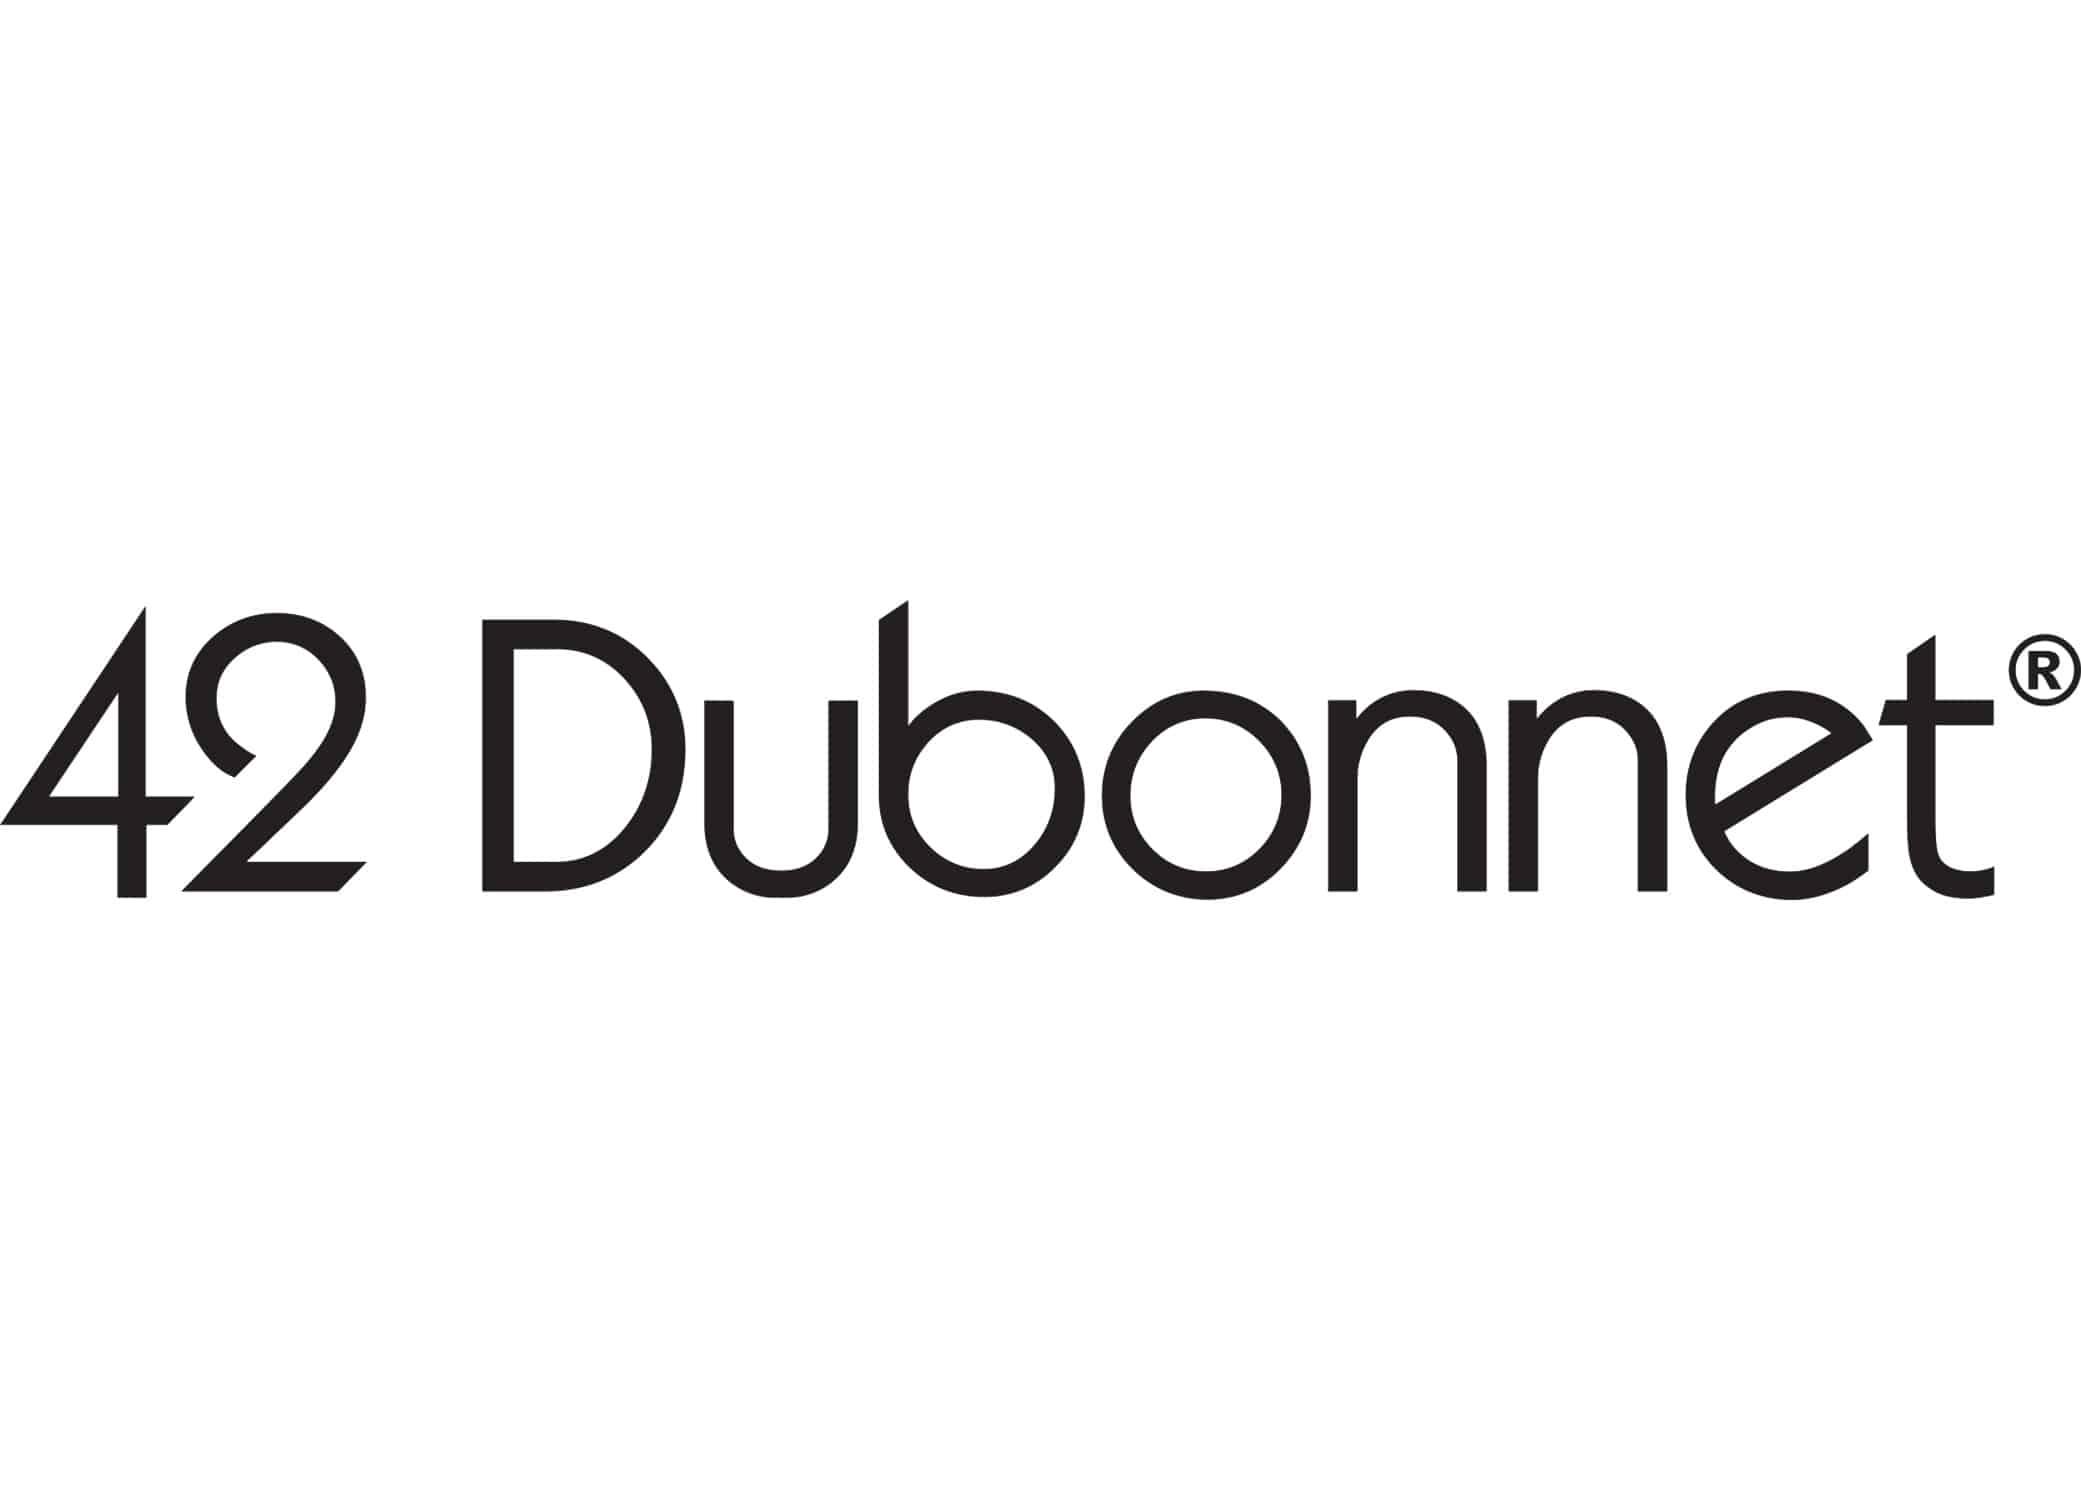 42 Dubonnet makeup brand identity logo design in all black Futura font.